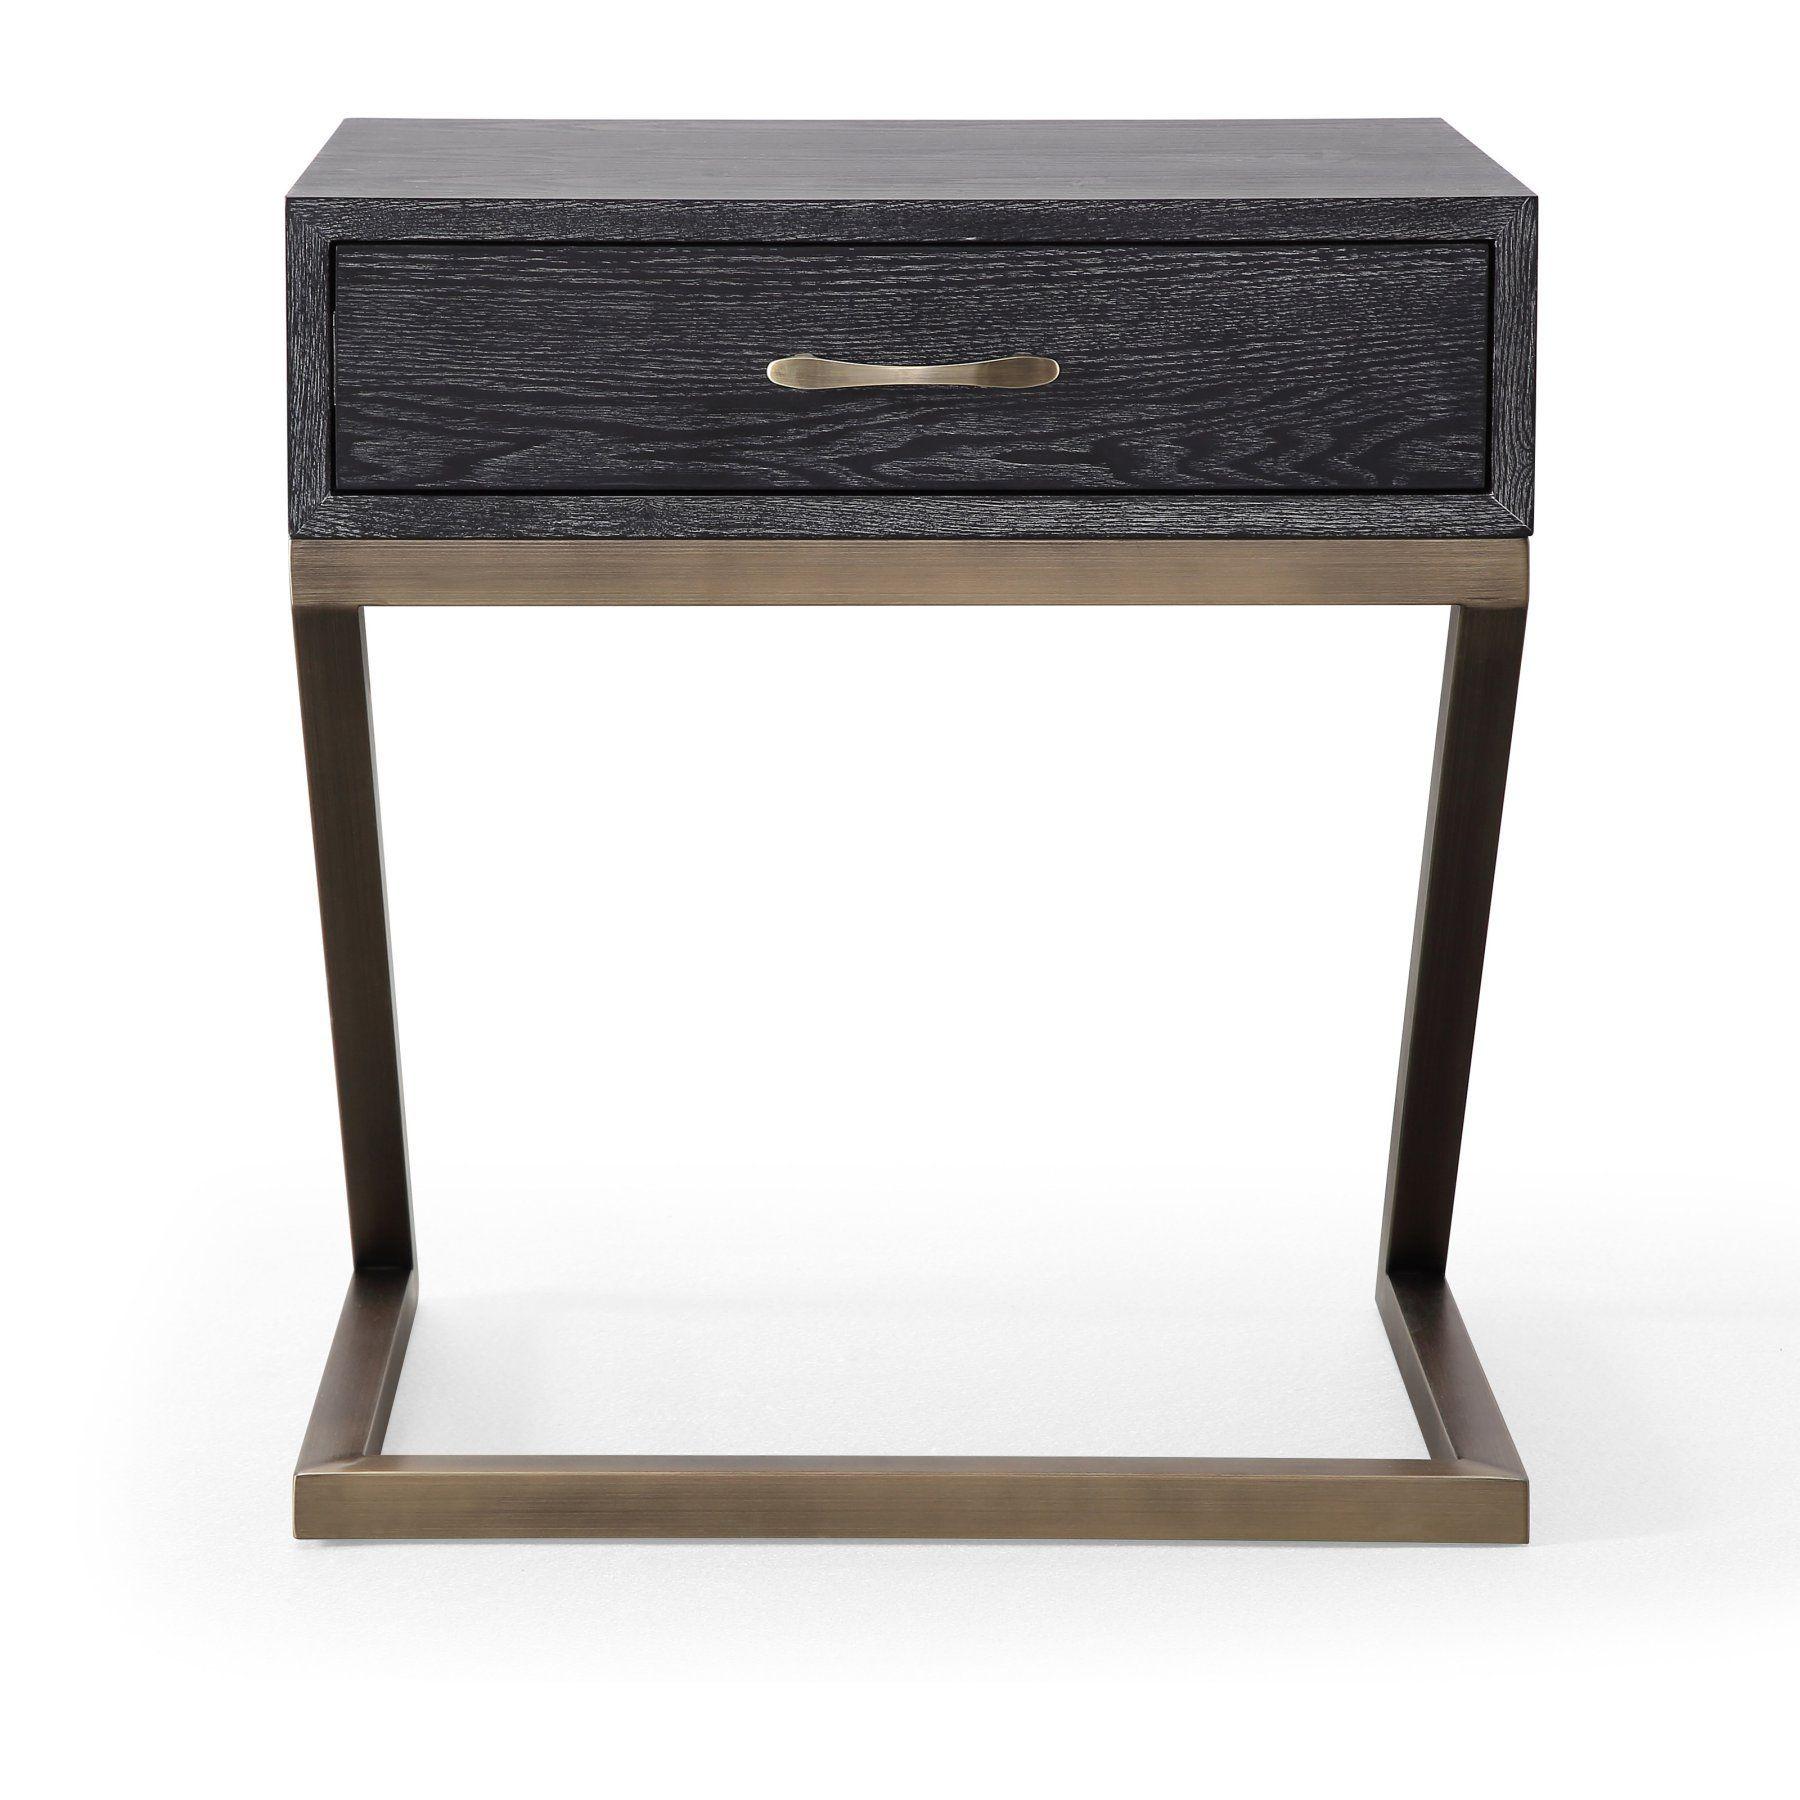 TOV Furniture Mason End Table - TOV-L6140